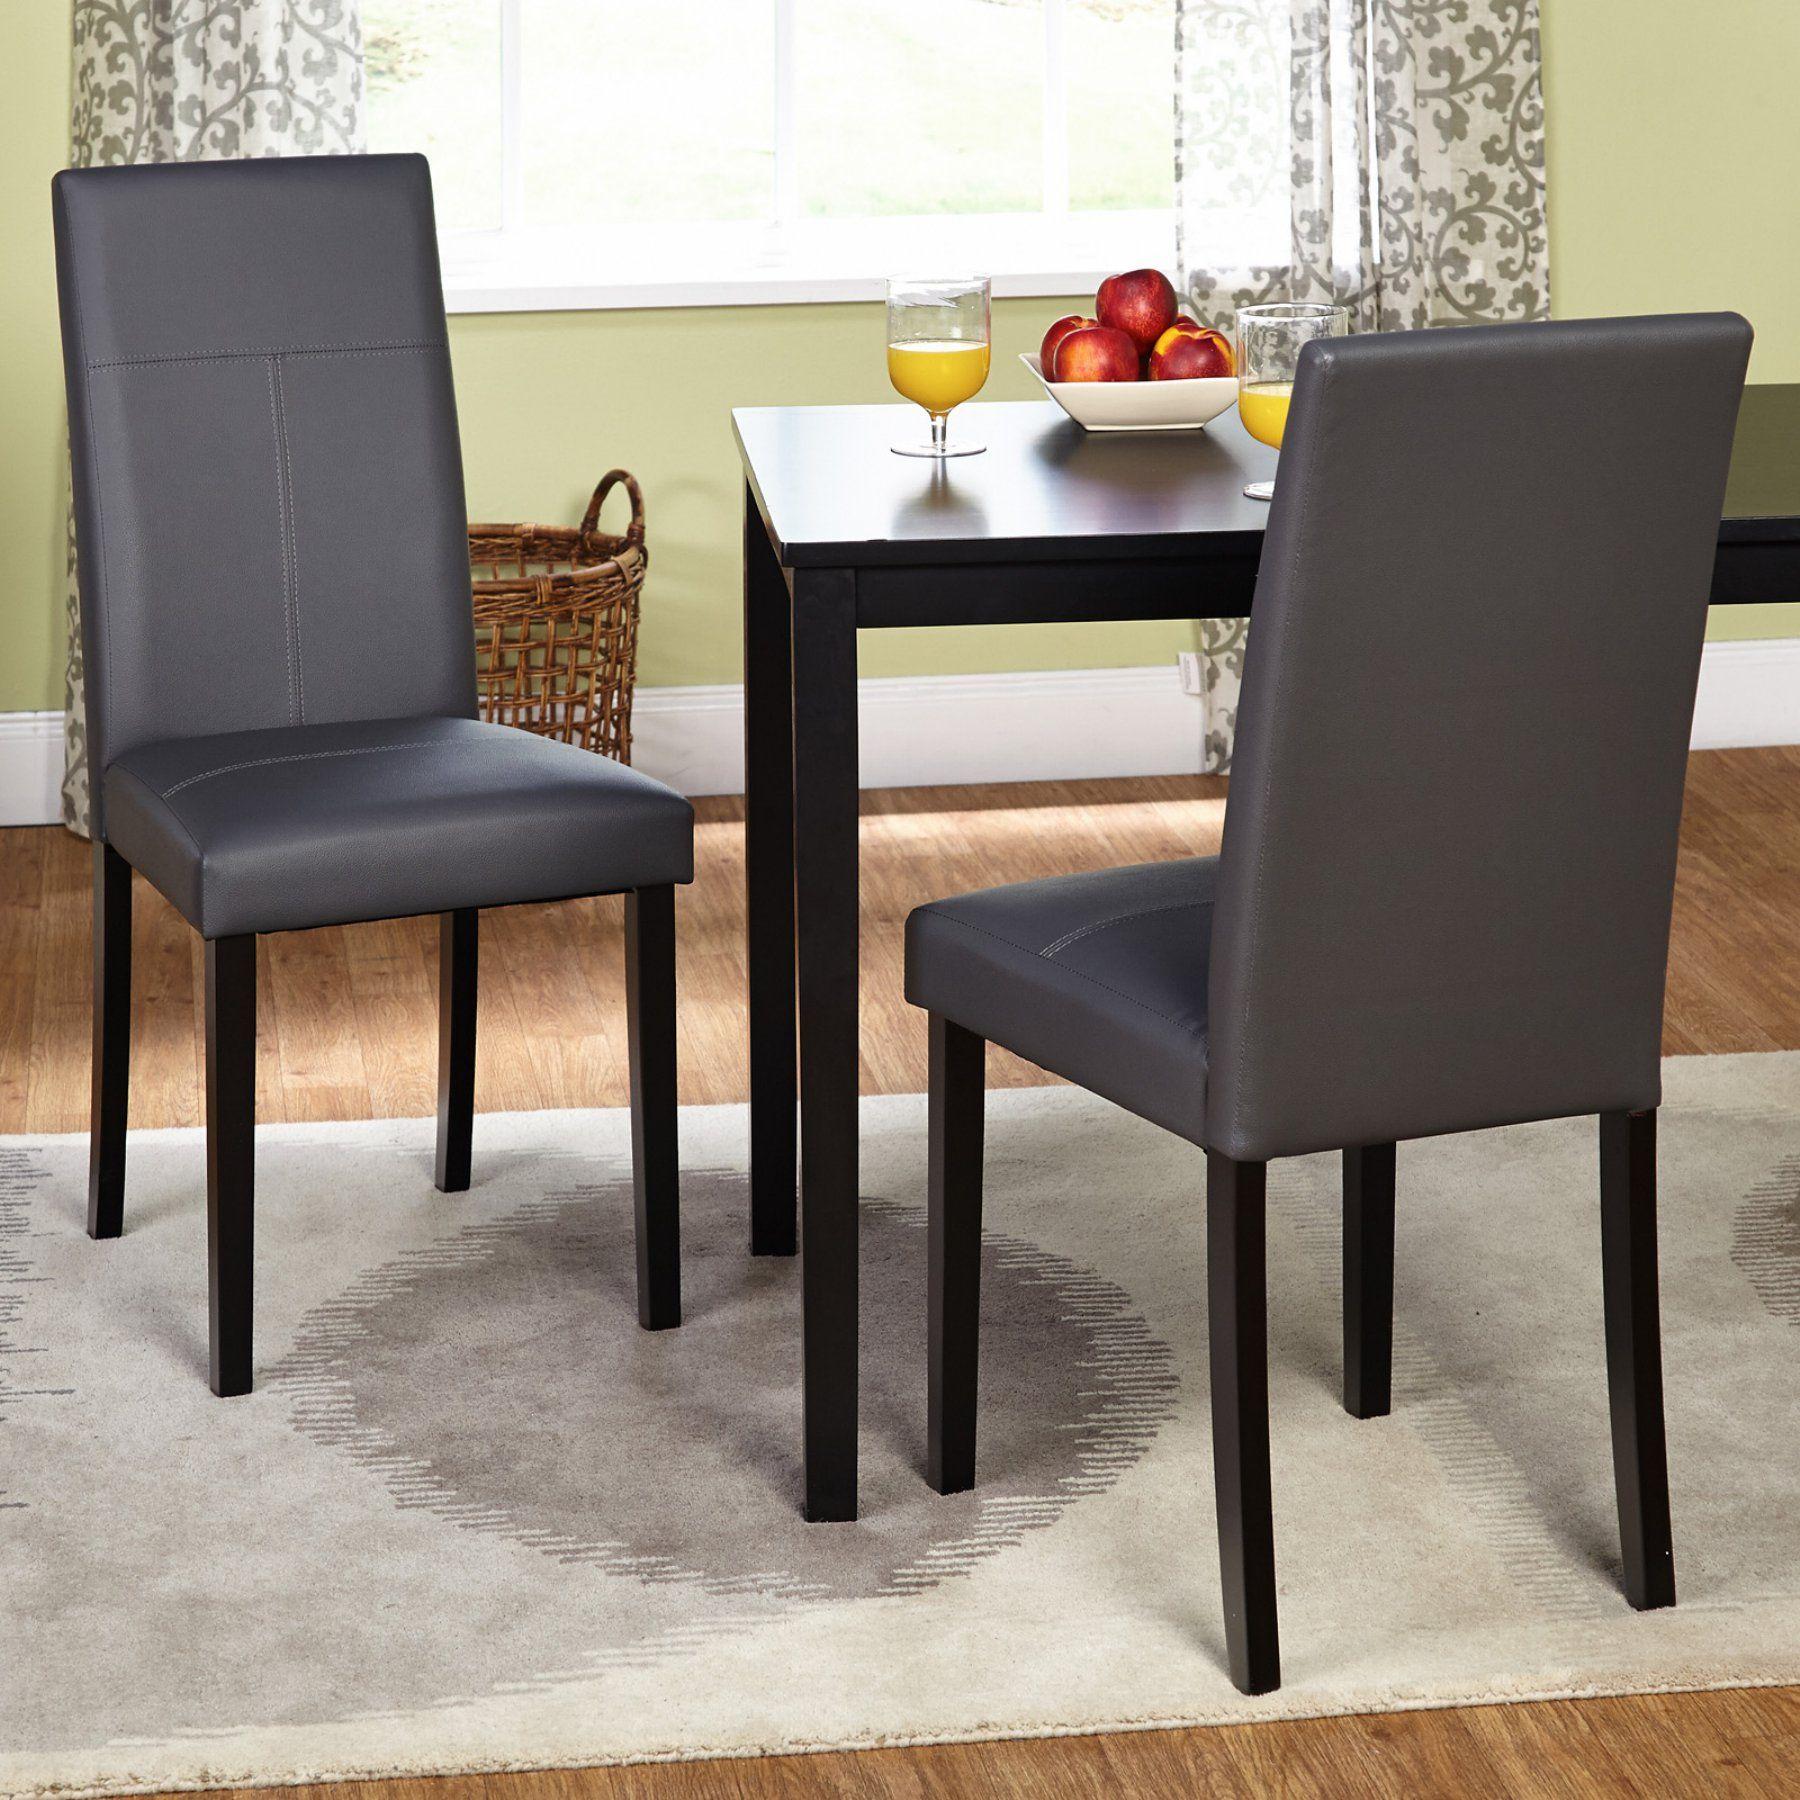 Target Marketing Systems Bettega Parson Chair Set Of 2